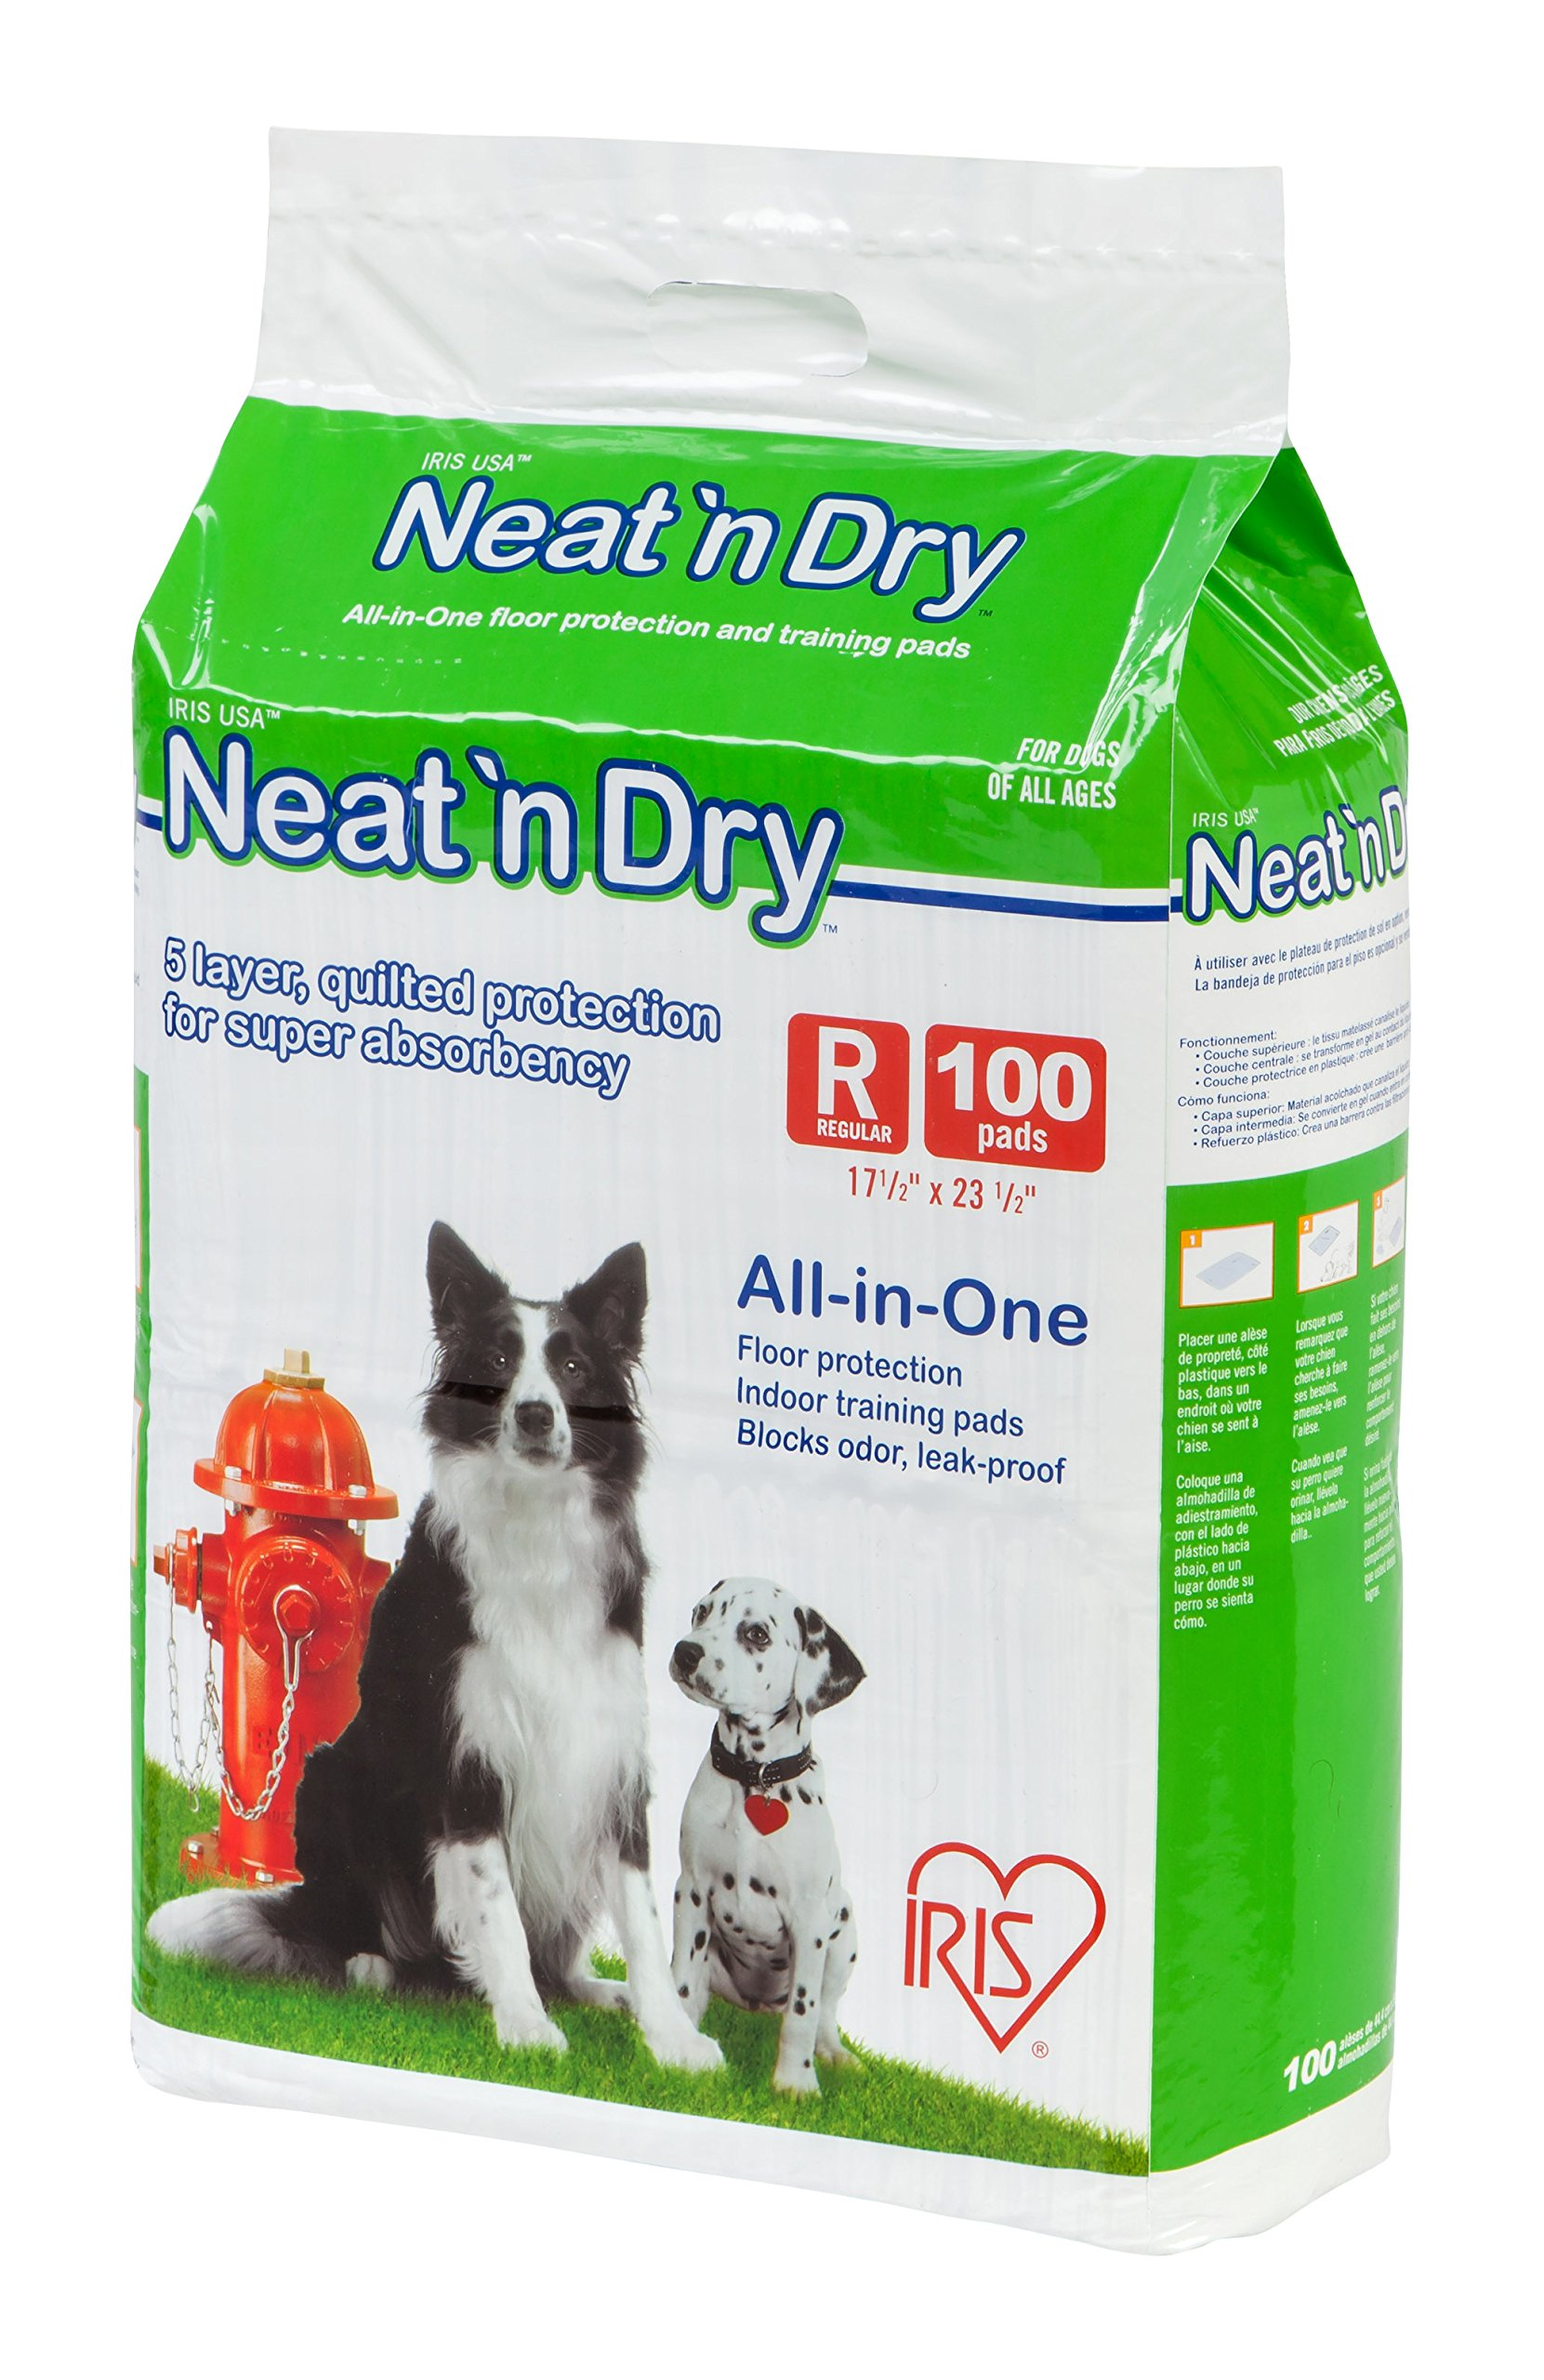 IRIS Neat 'n Dry Premium Pet Training Pads, Regular, 17.5'' x 23.5'', 100 Count